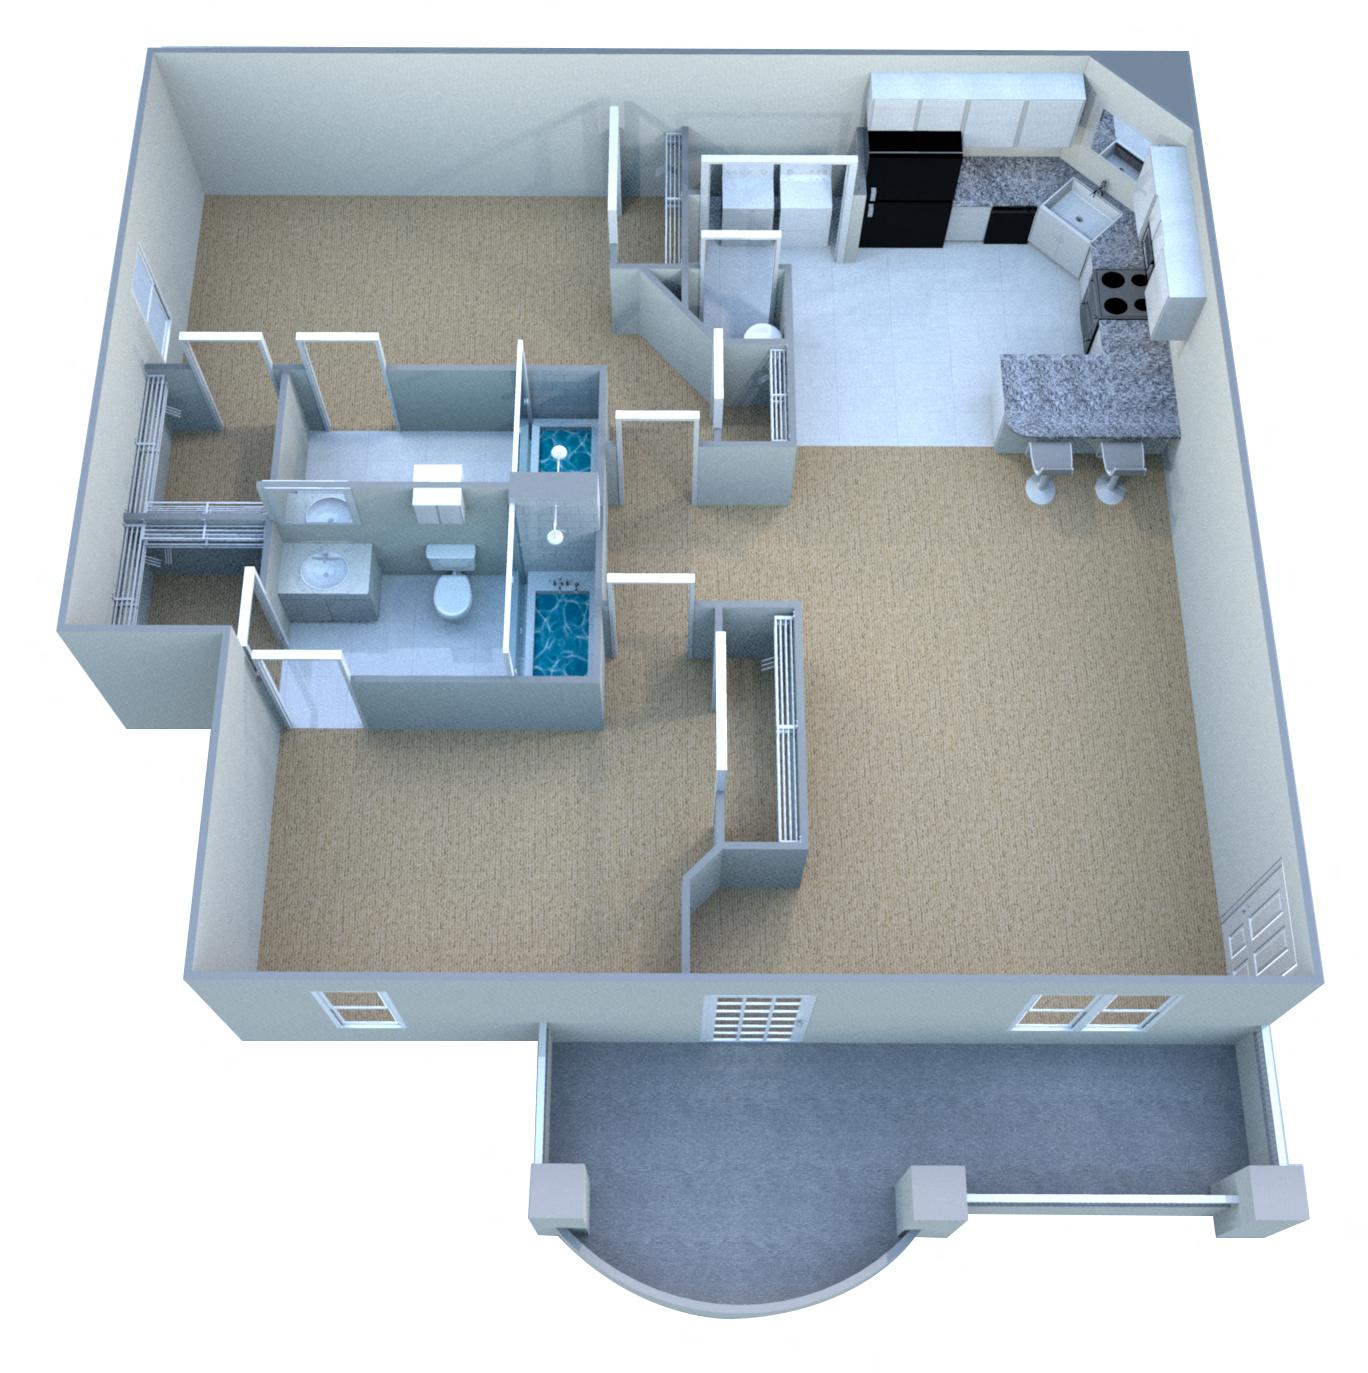 Owasso Apartments: Floor Plans Of The Greens At Owasso III/IV In Owasso, OK